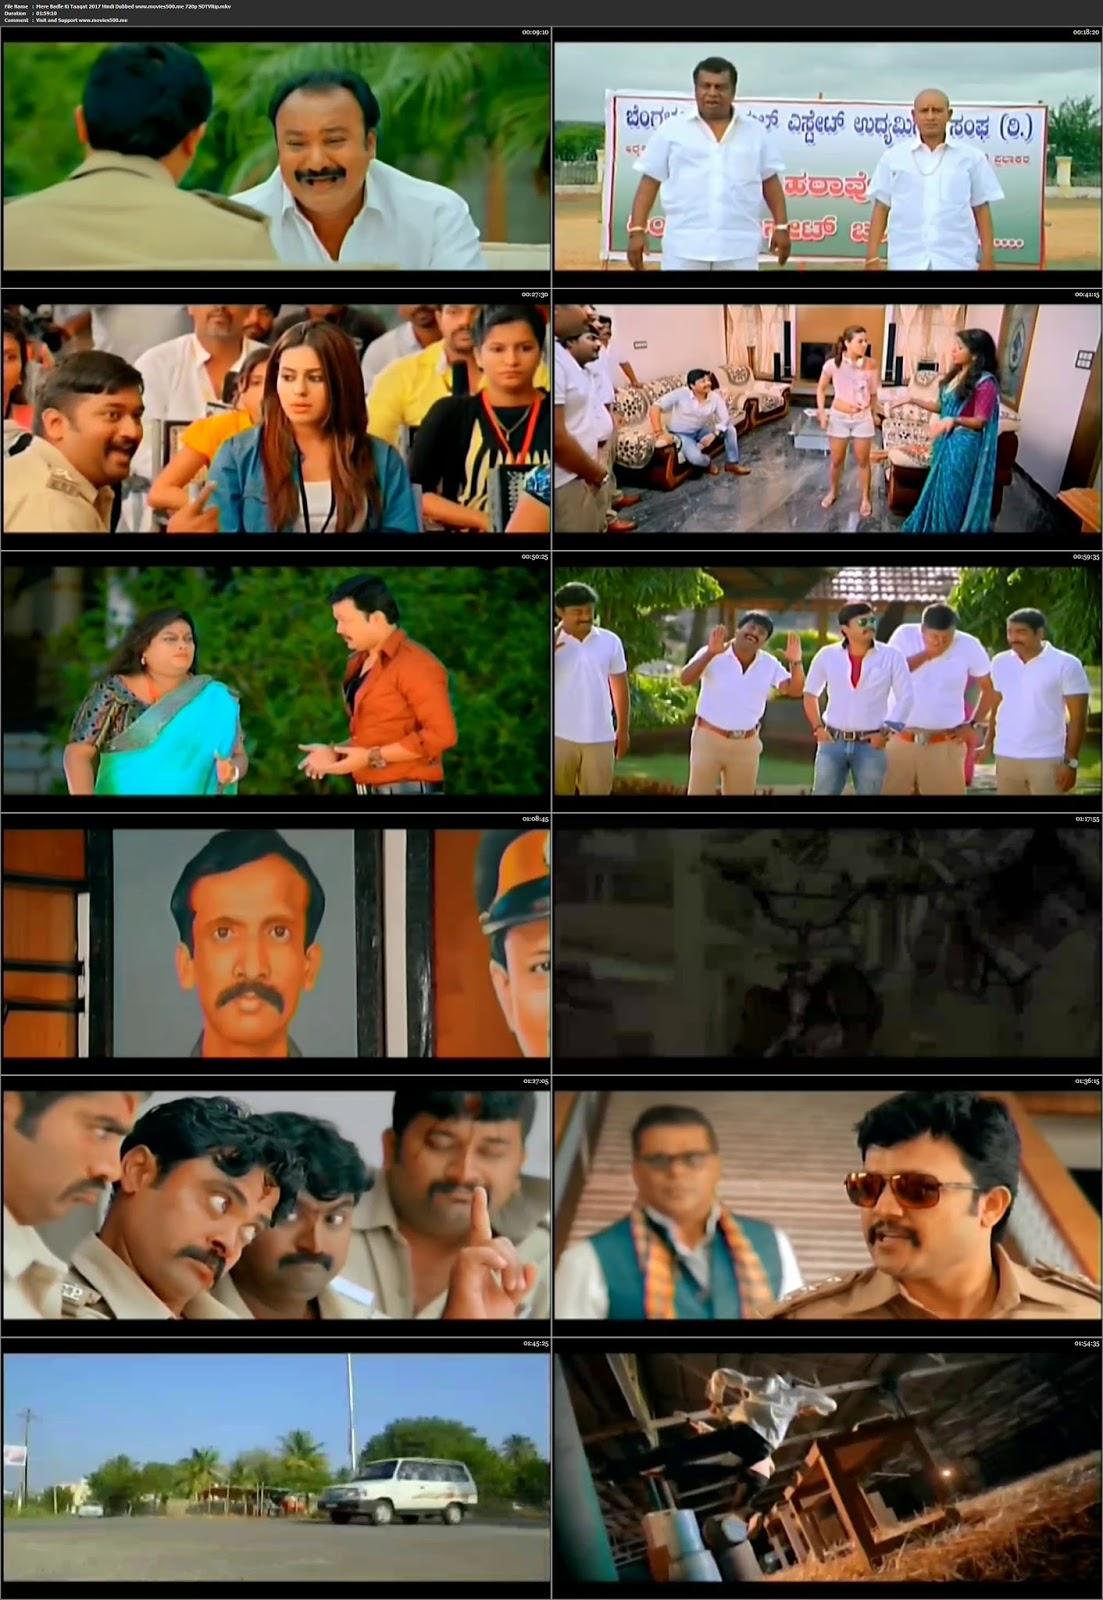 Mere Badle Ki Taaqat 2017 Hindi Dubbed Full Movie SDTVRip 720p at createkits.com